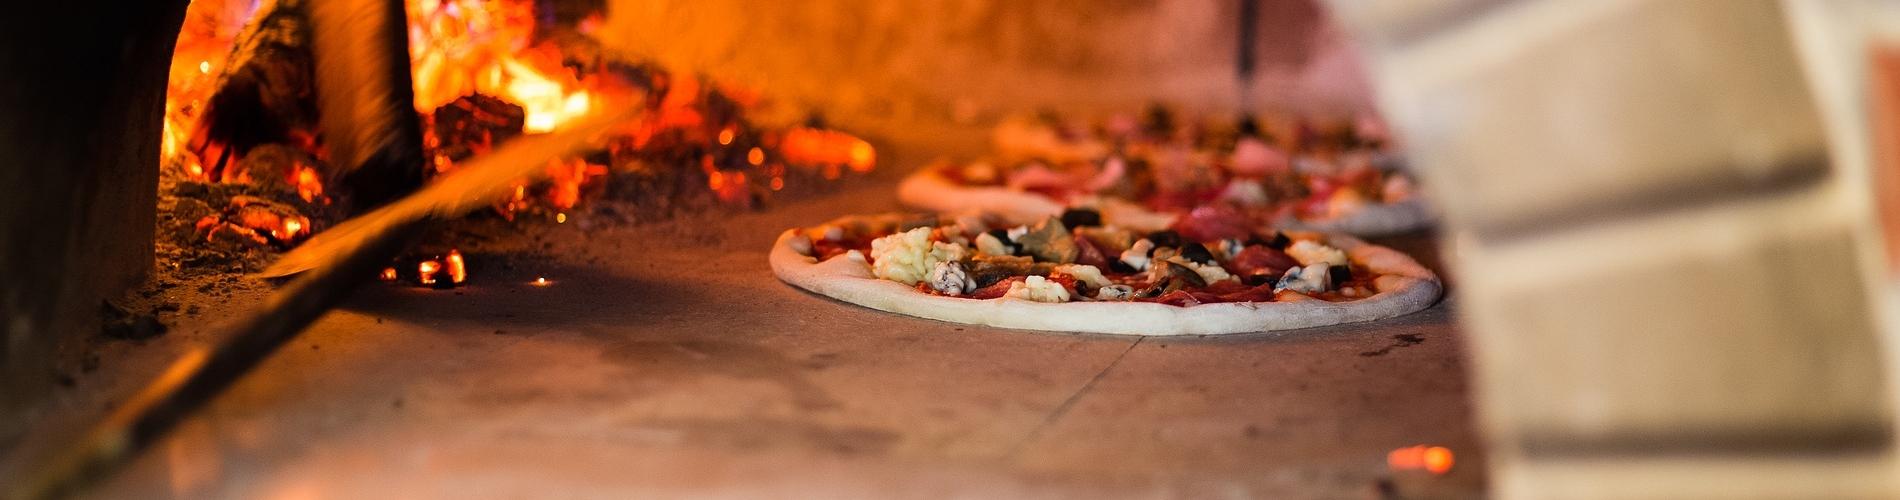 Pizza - Häfeli Ofenbau